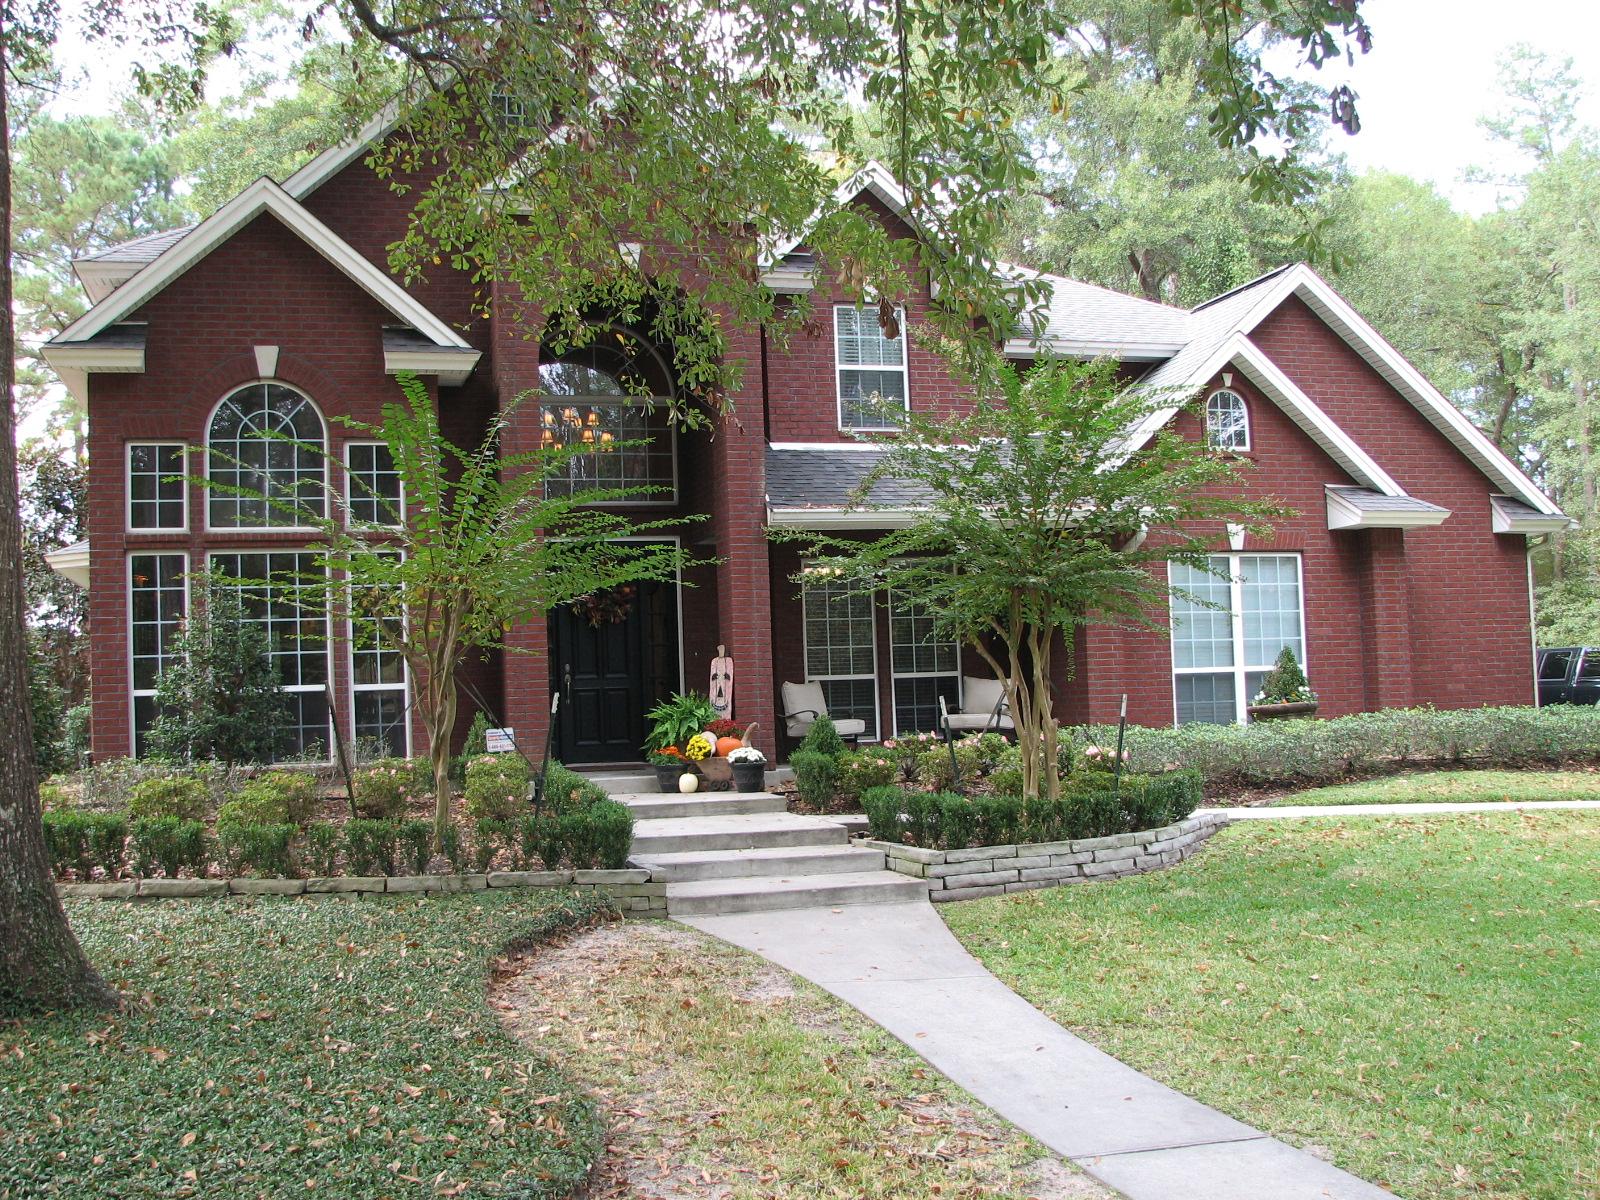 815 Hickory Lane, Jasper, Texas 75951